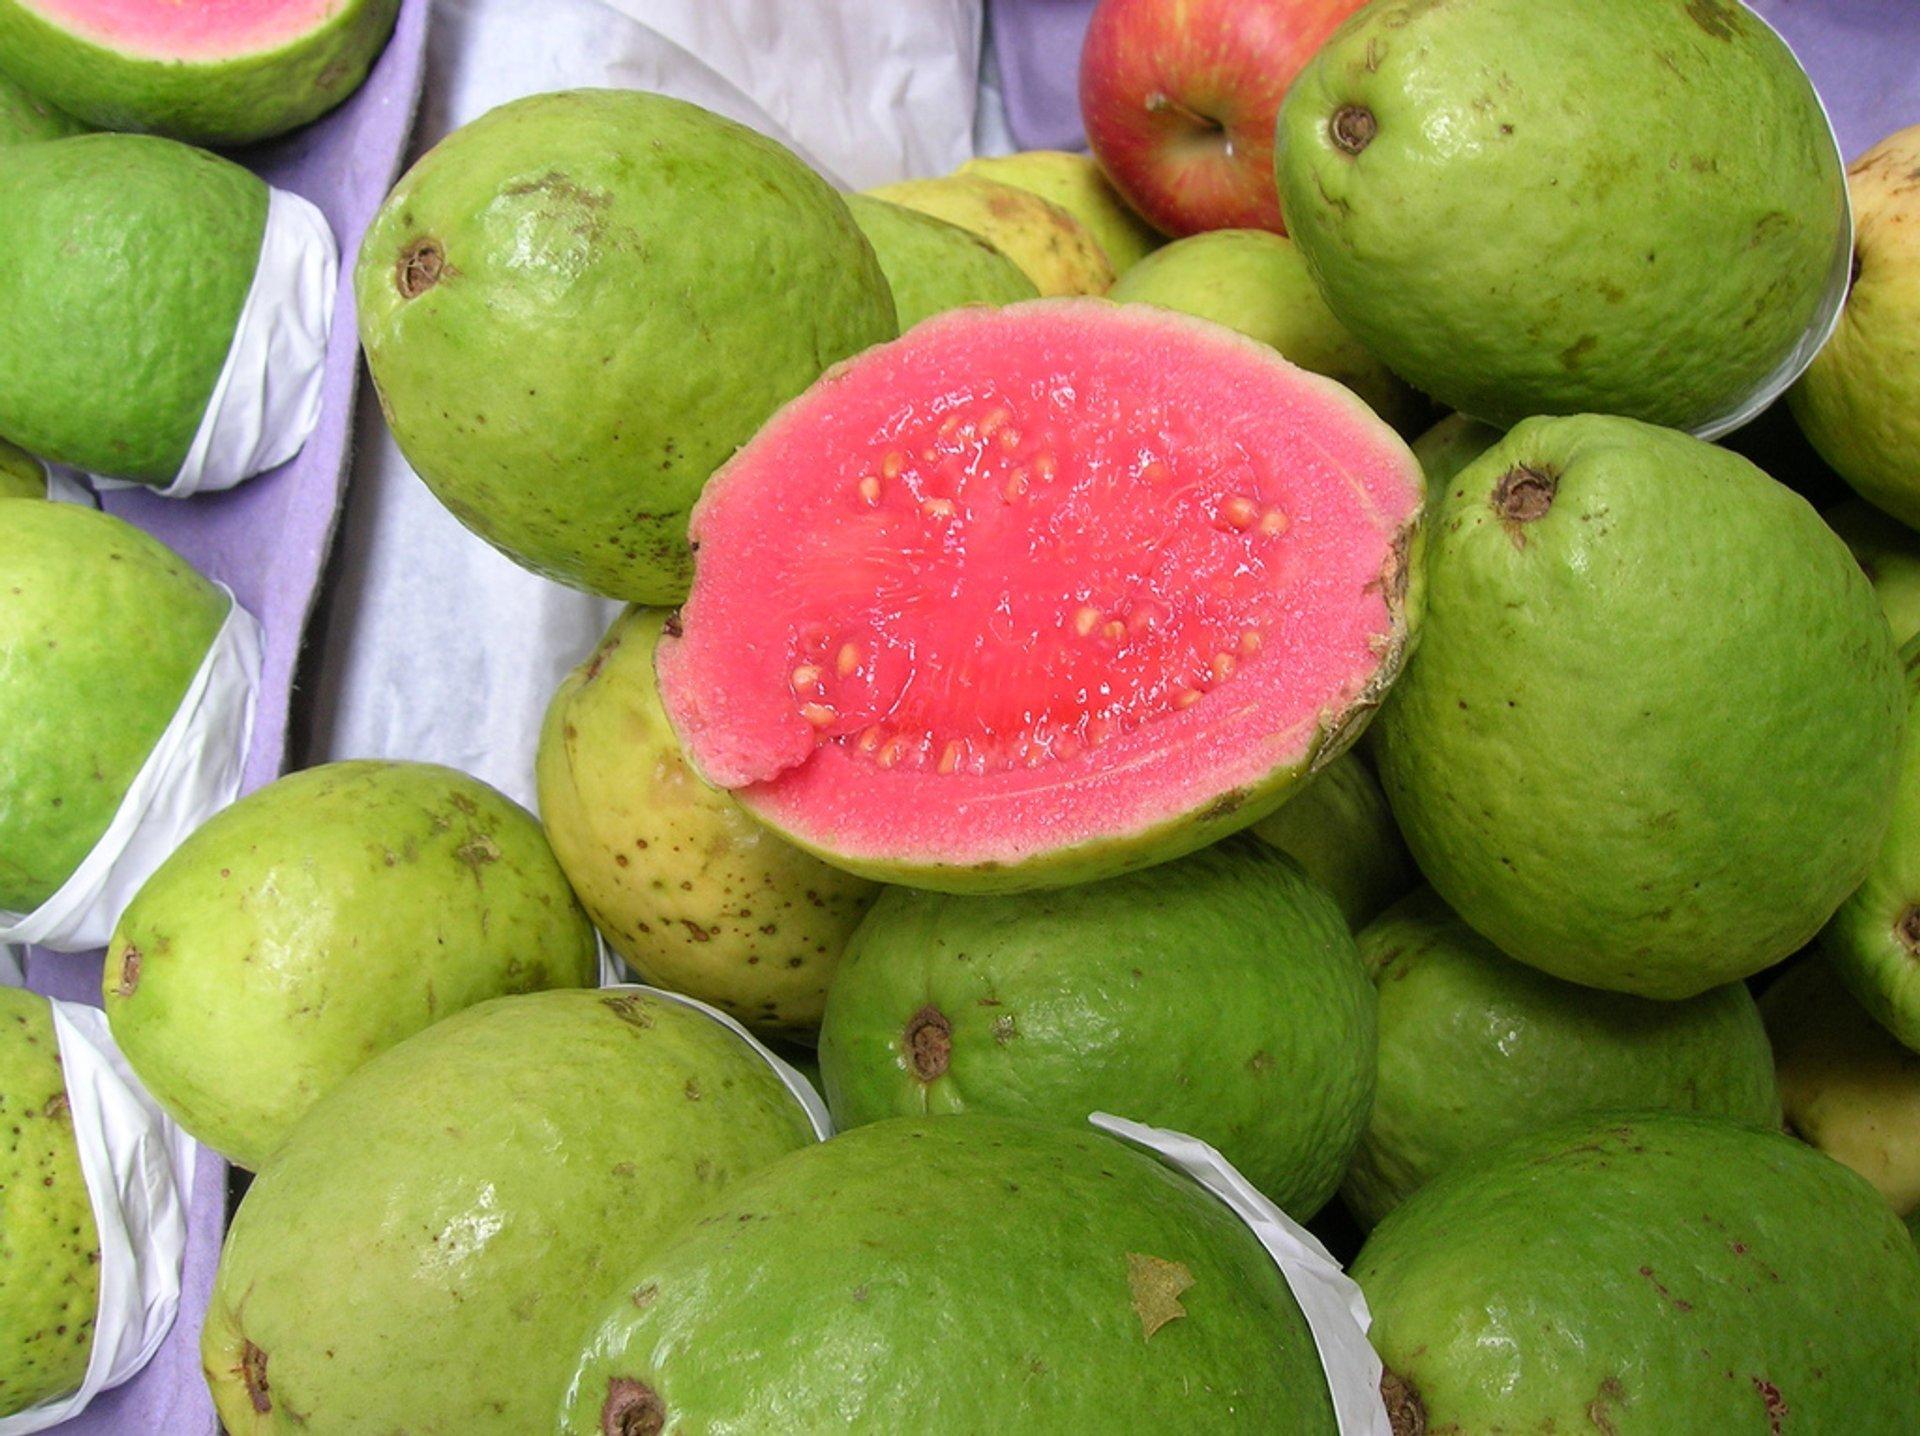 Guava or Goiaba in Rio de Janeiro - Best Season 2020